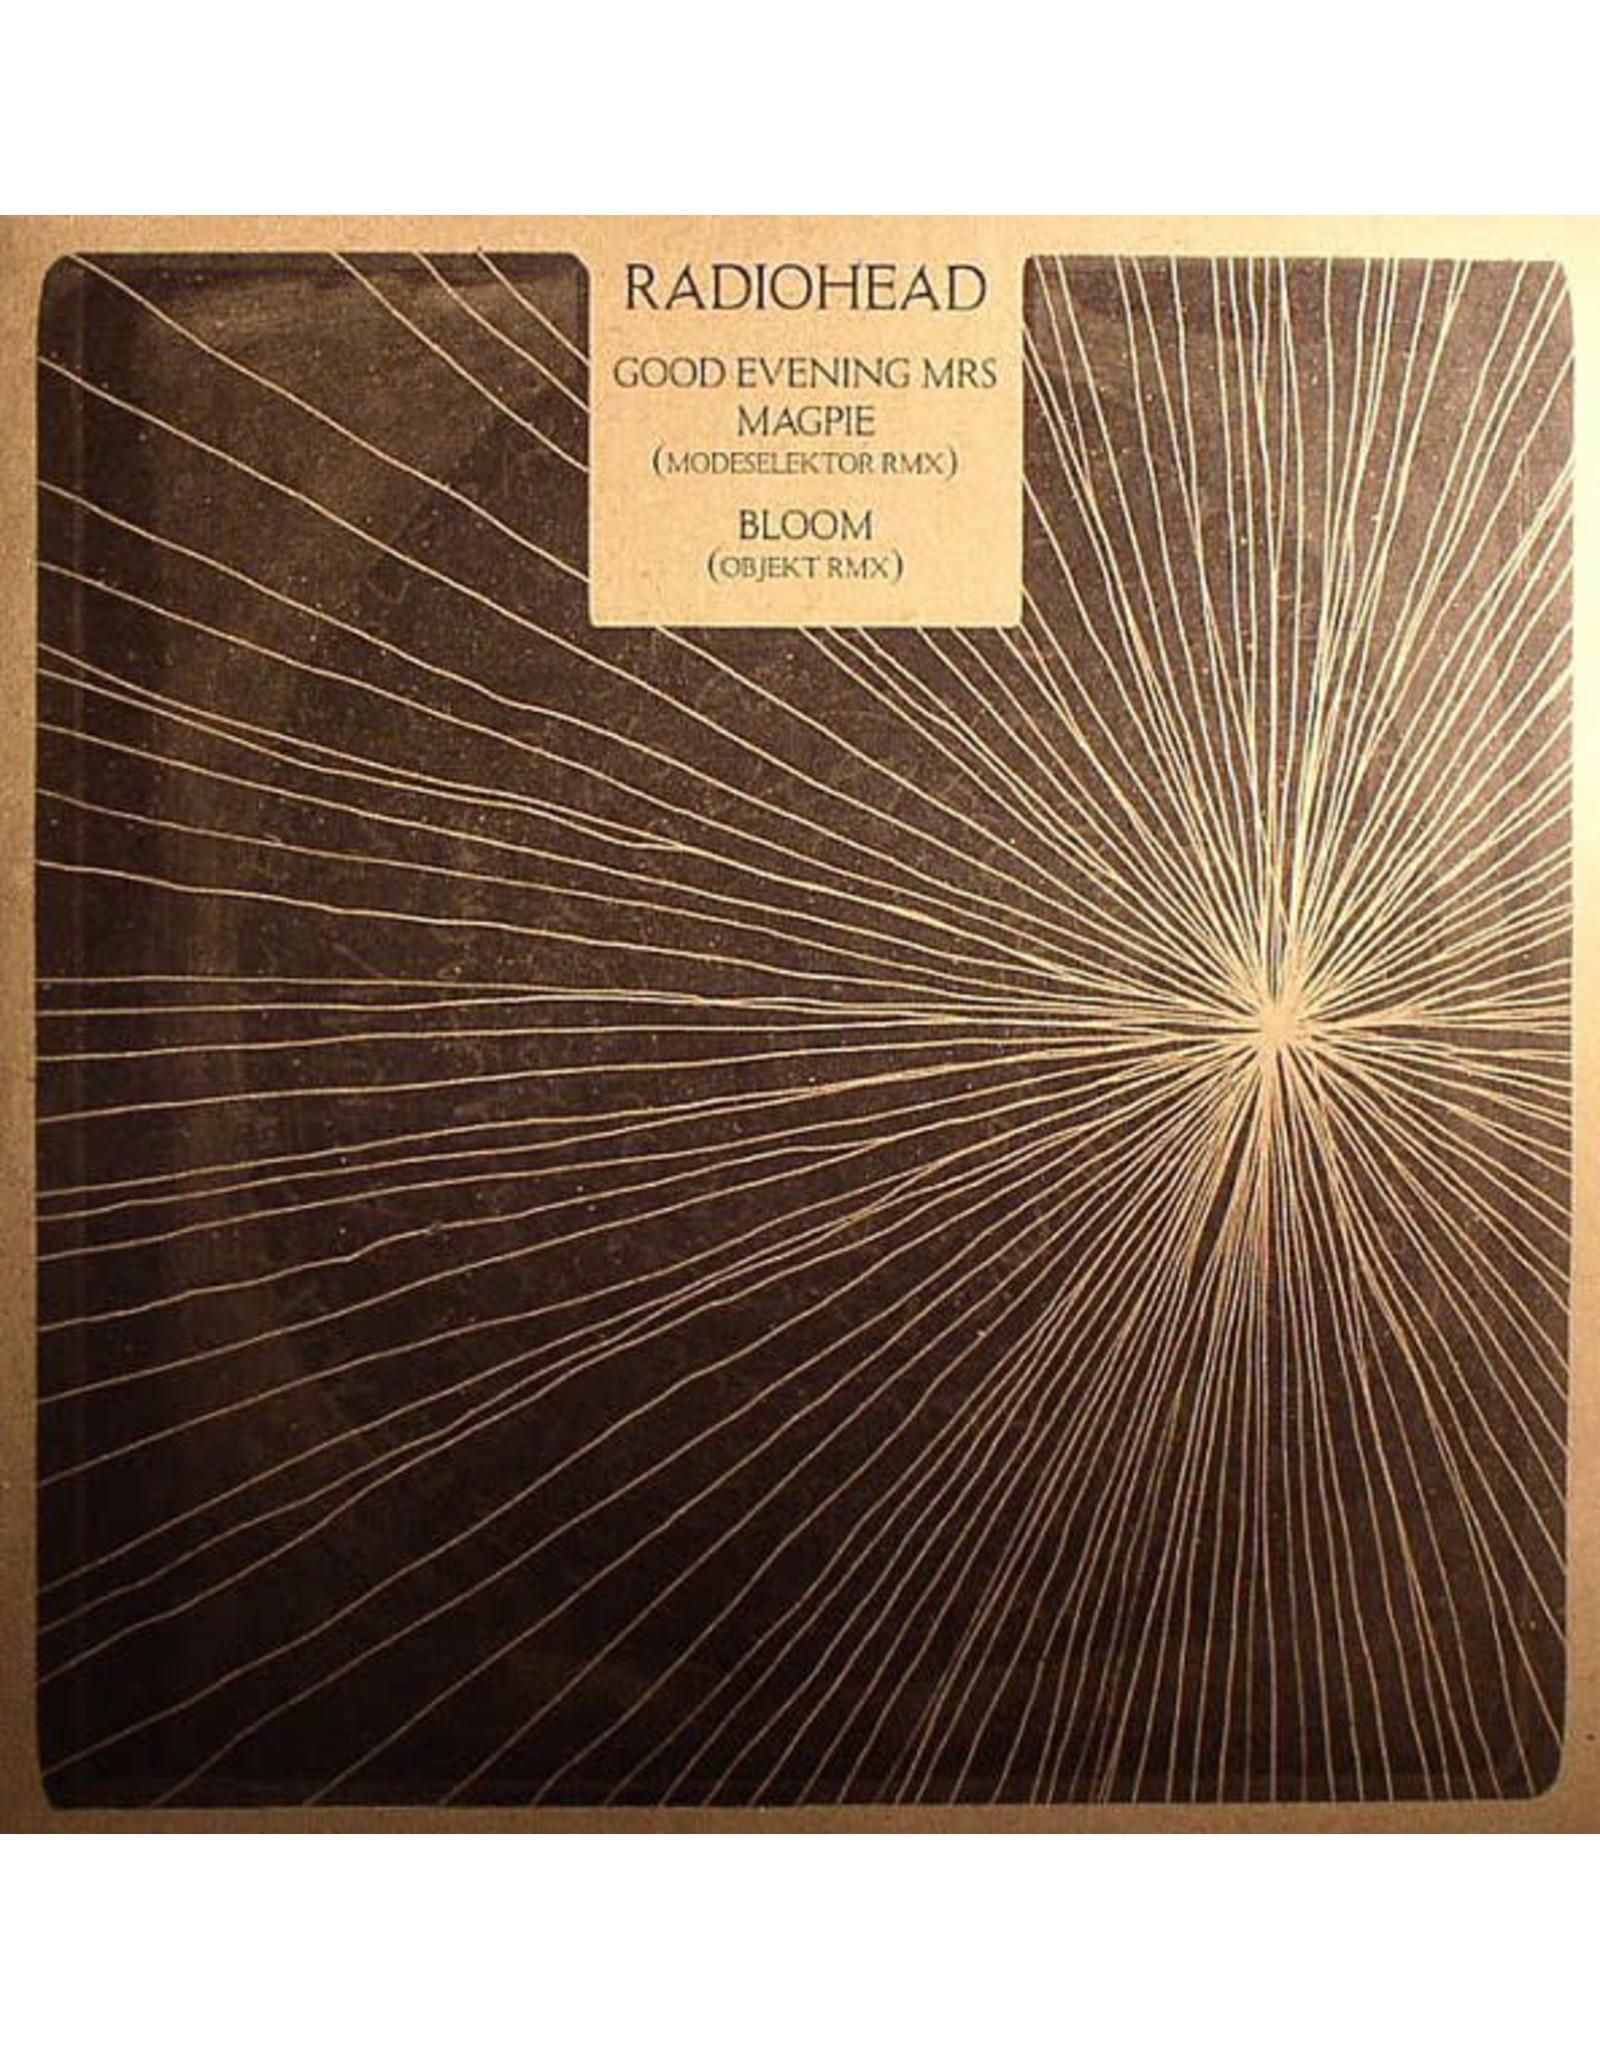 Radiohead - Good Evening Mrs. Magpie/Bloom LP